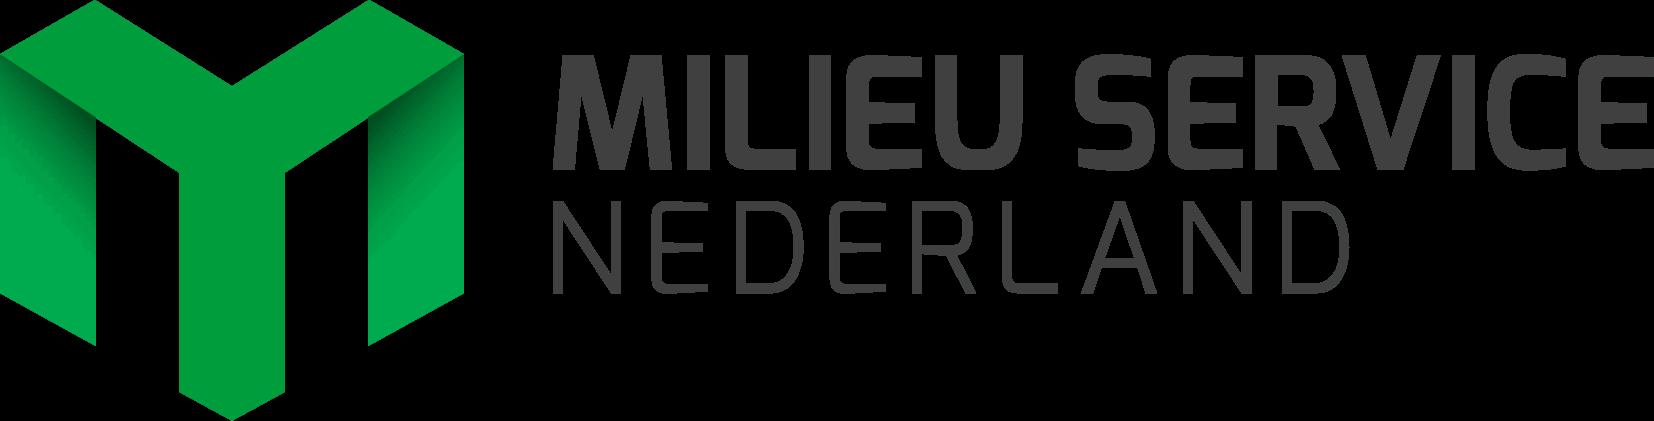 milieu-service-nederland